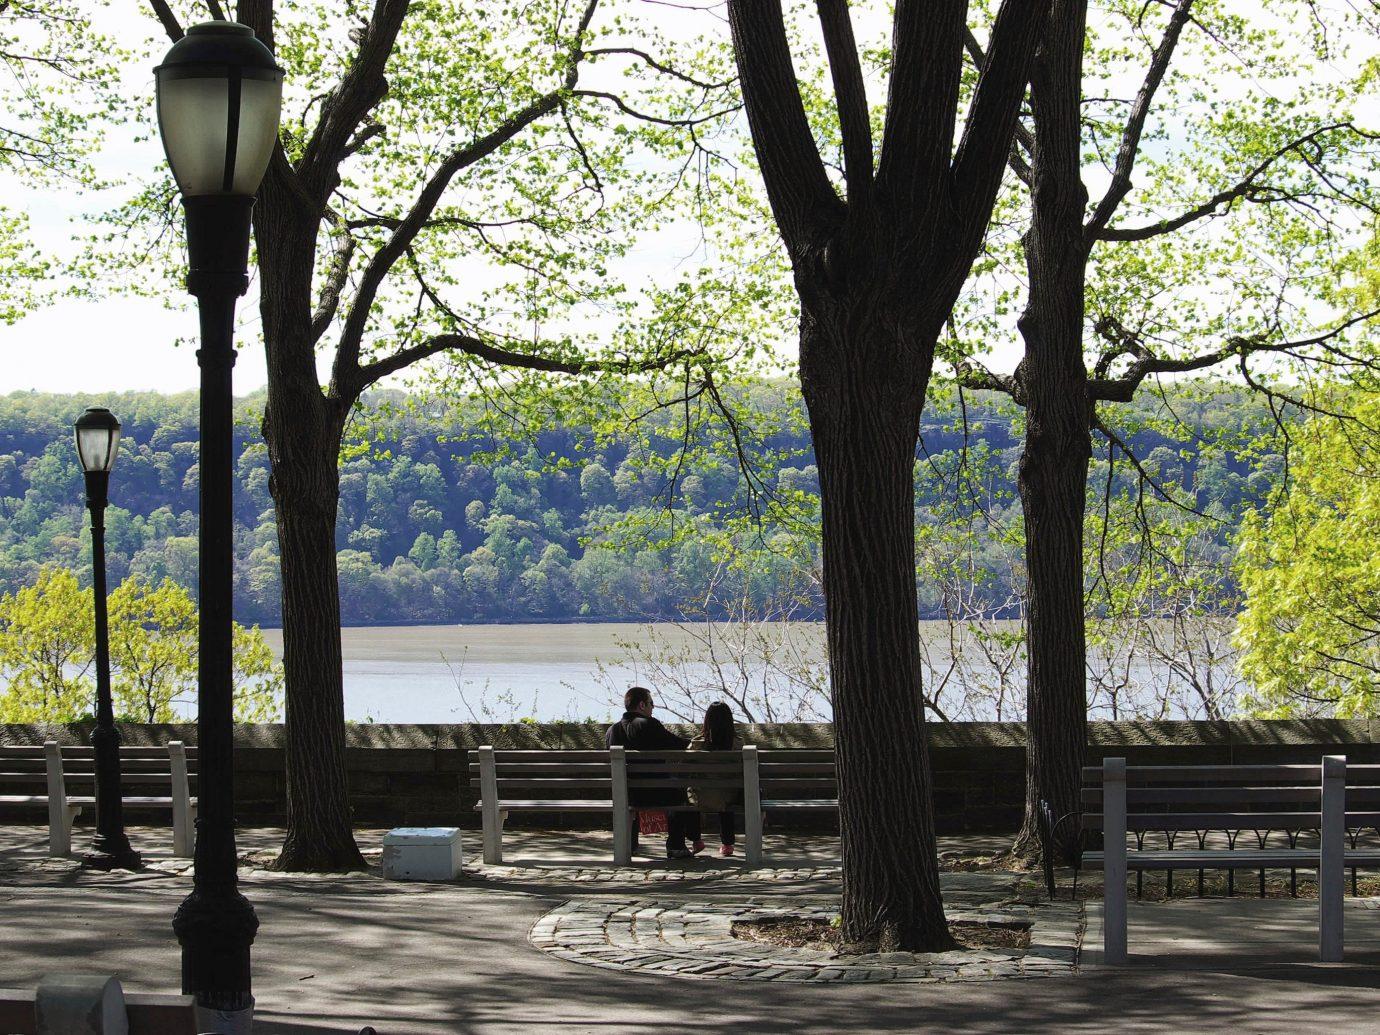 Trip Ideas tree outdoor park season woody plant walkway shade day